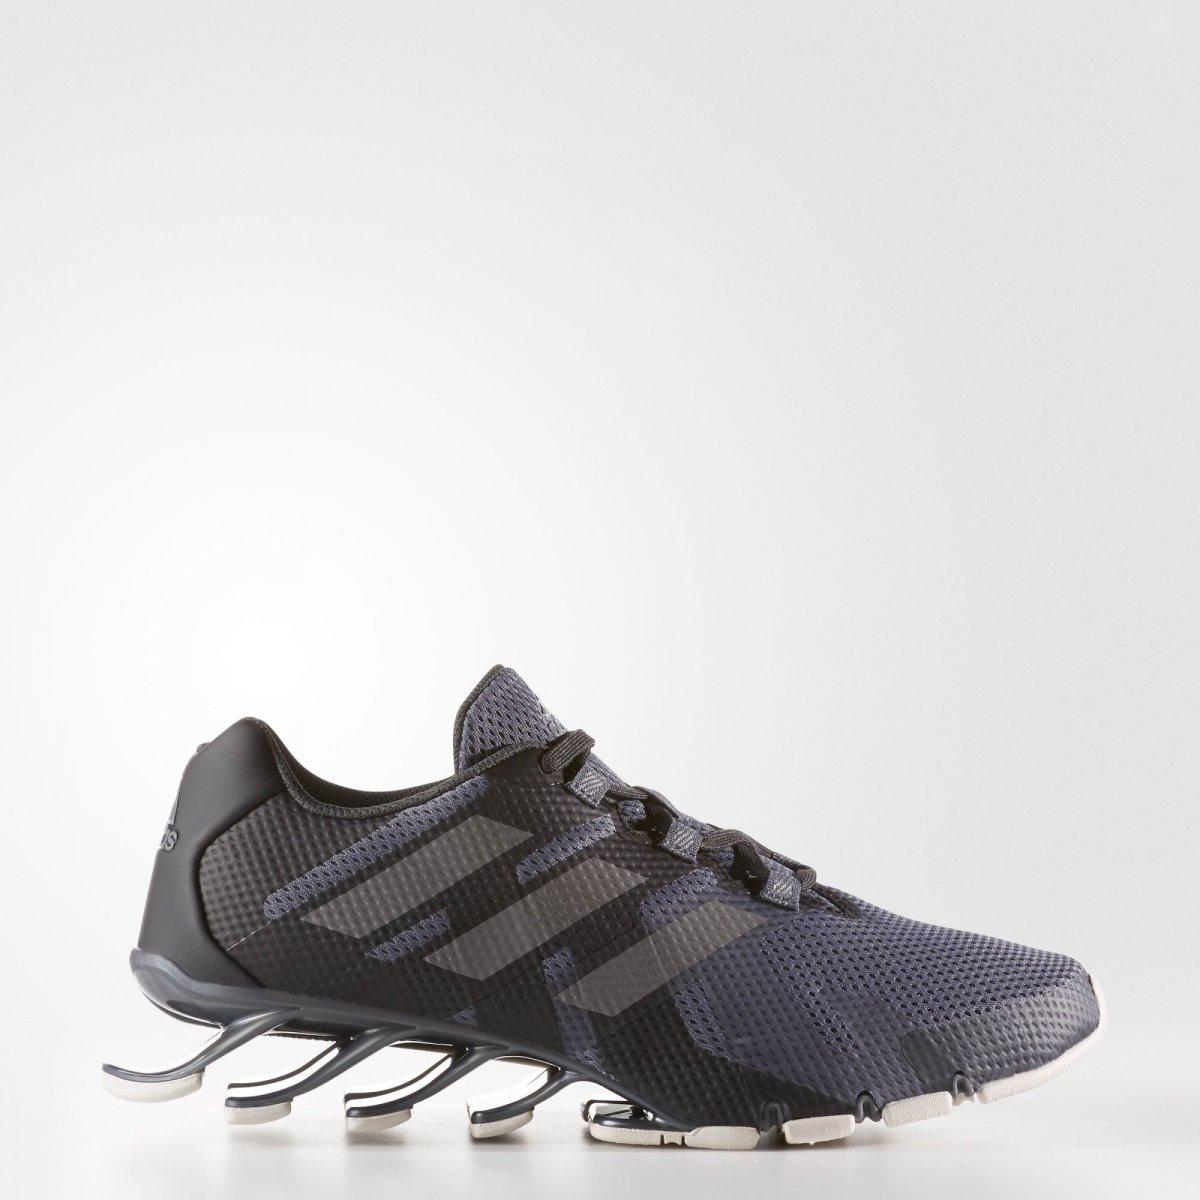 87d96897e ... sale tênis masculino adidas springblade e force b49421 502f3 7ffd8 ...